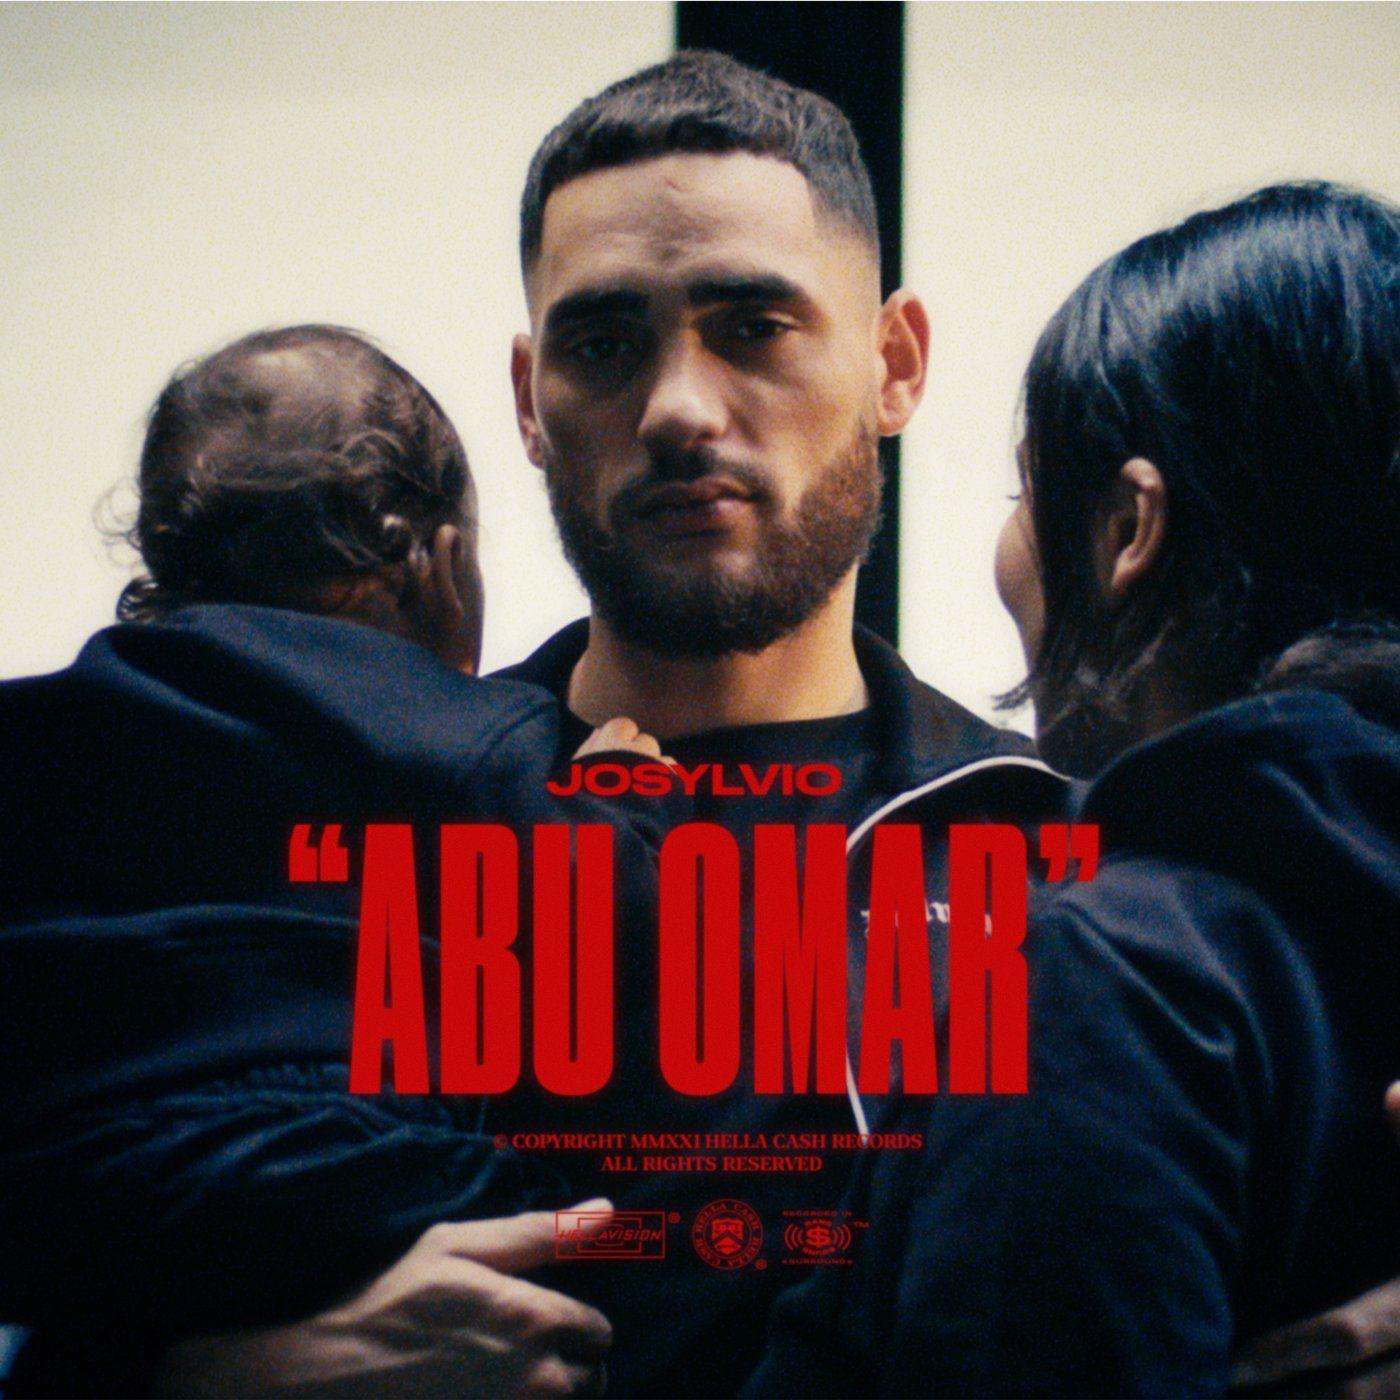 Josylvio - Abu Omar album cover